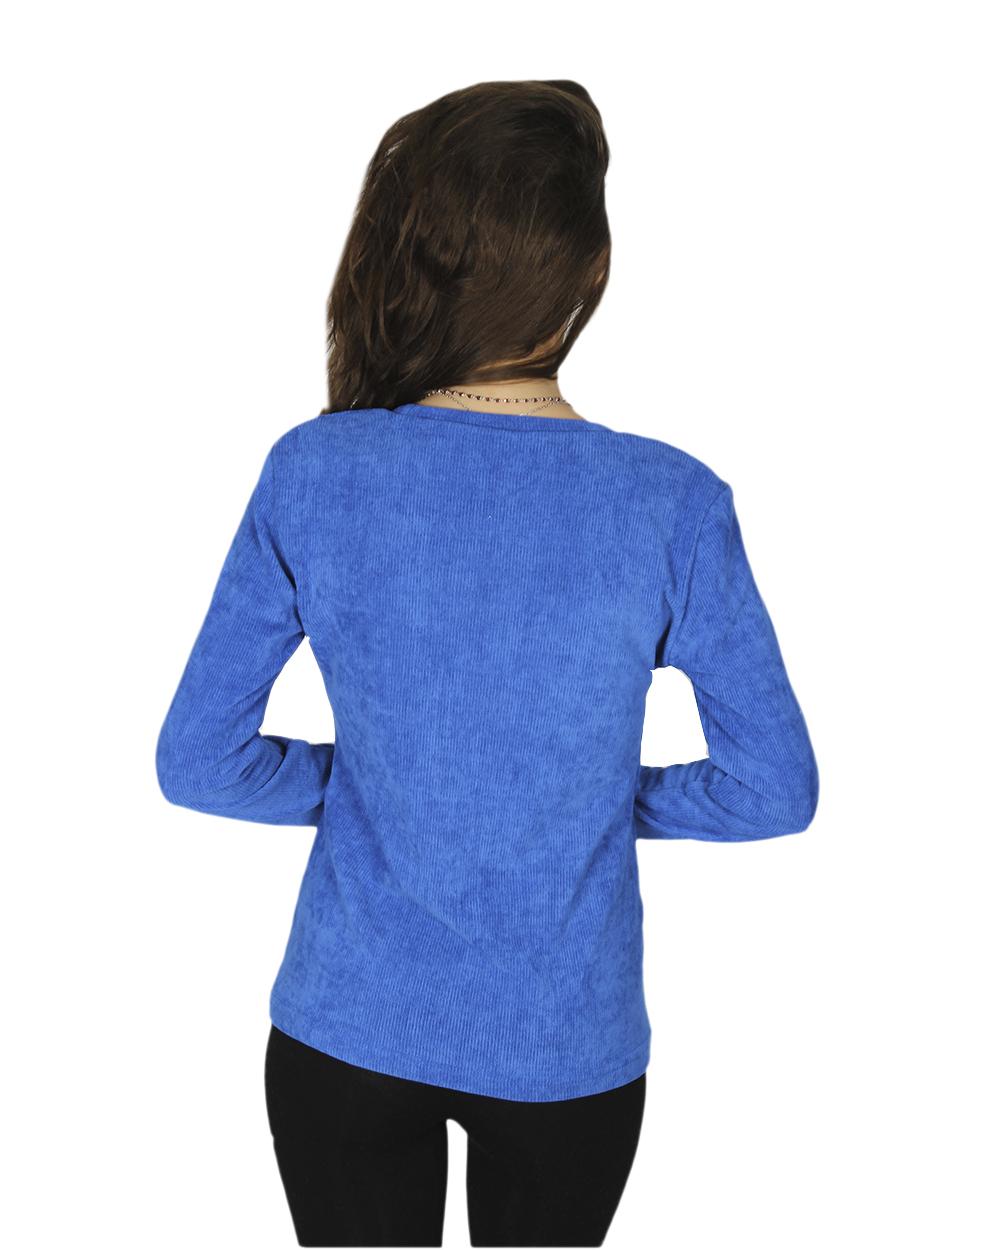 Синий джемпер женский